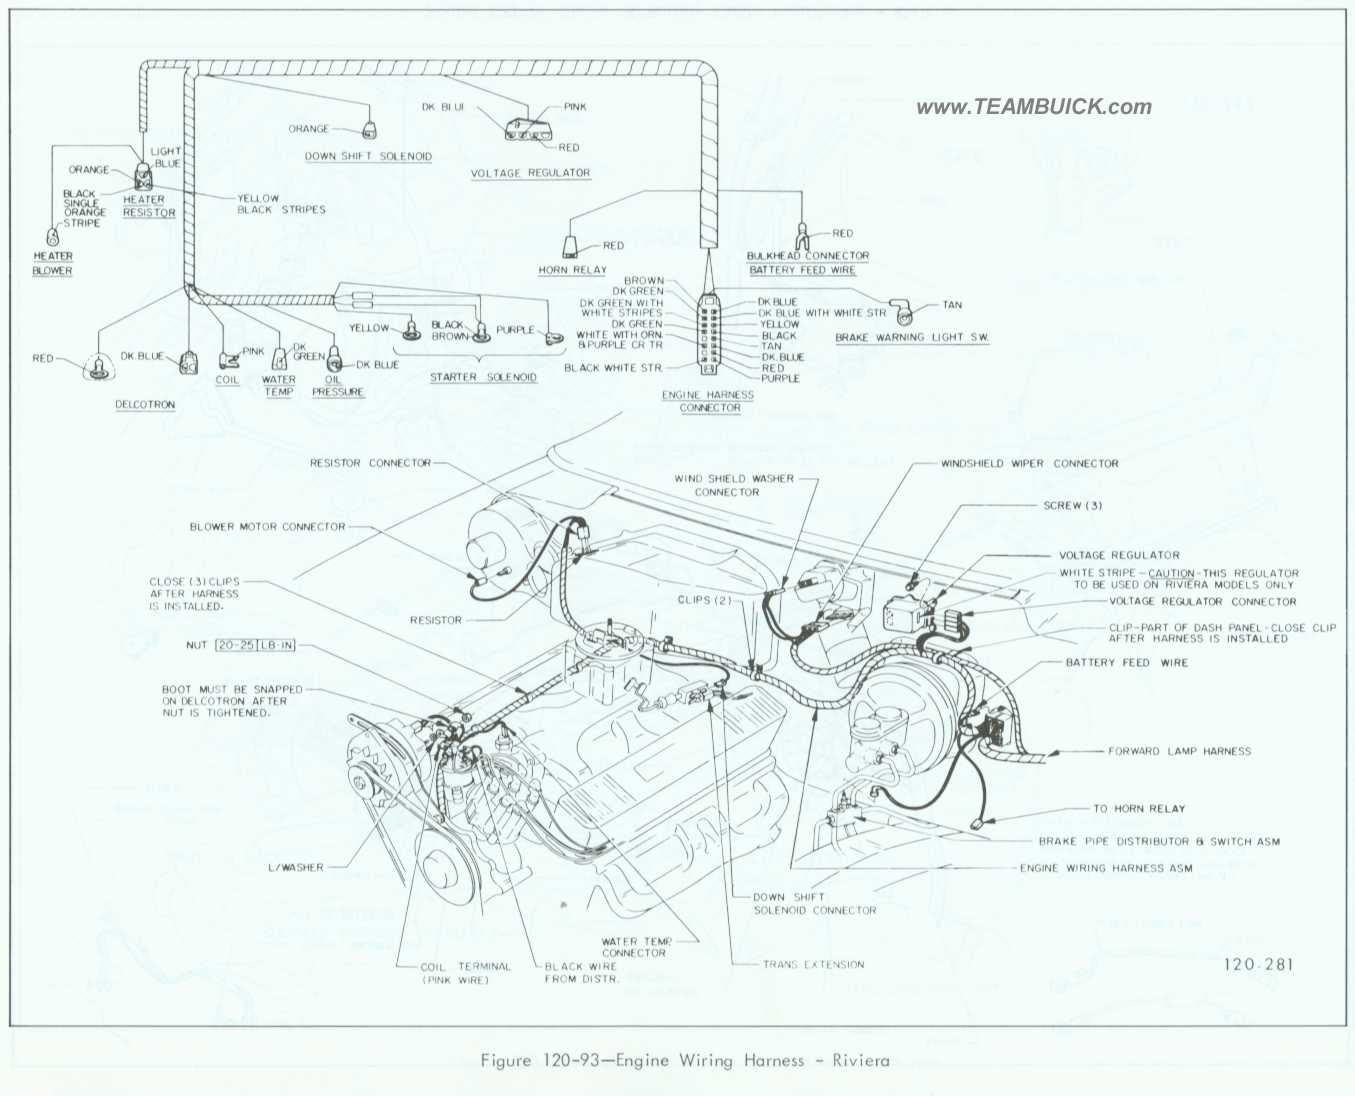 1995 Buick Riviera Engine Diagram Wiring Diagram Active B Active B Bujinkan It